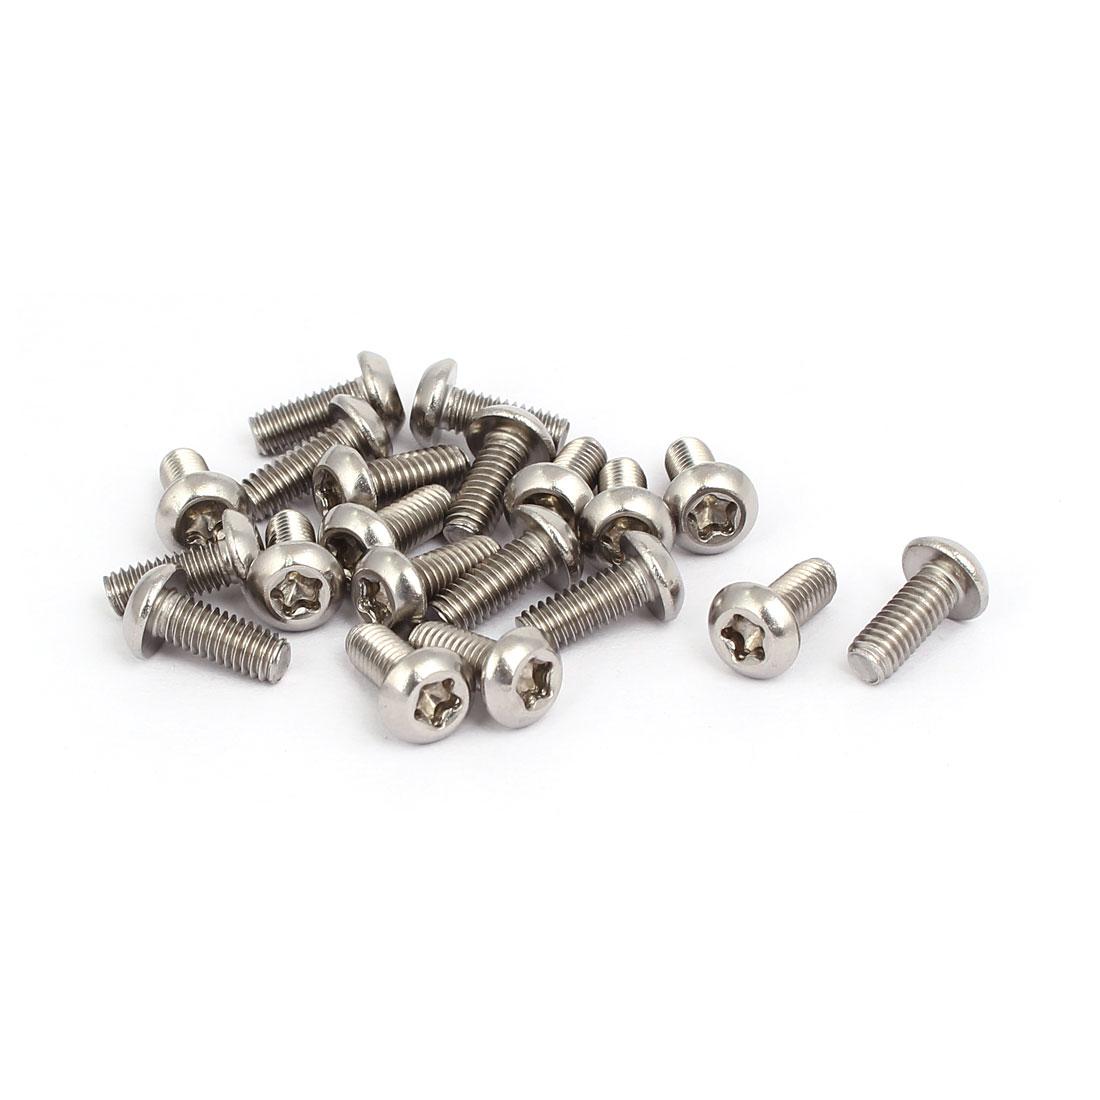 M4x10mm 304 Stainless Steel Fully Thread Button Head Torx Five-Lobe Screw 20pcs